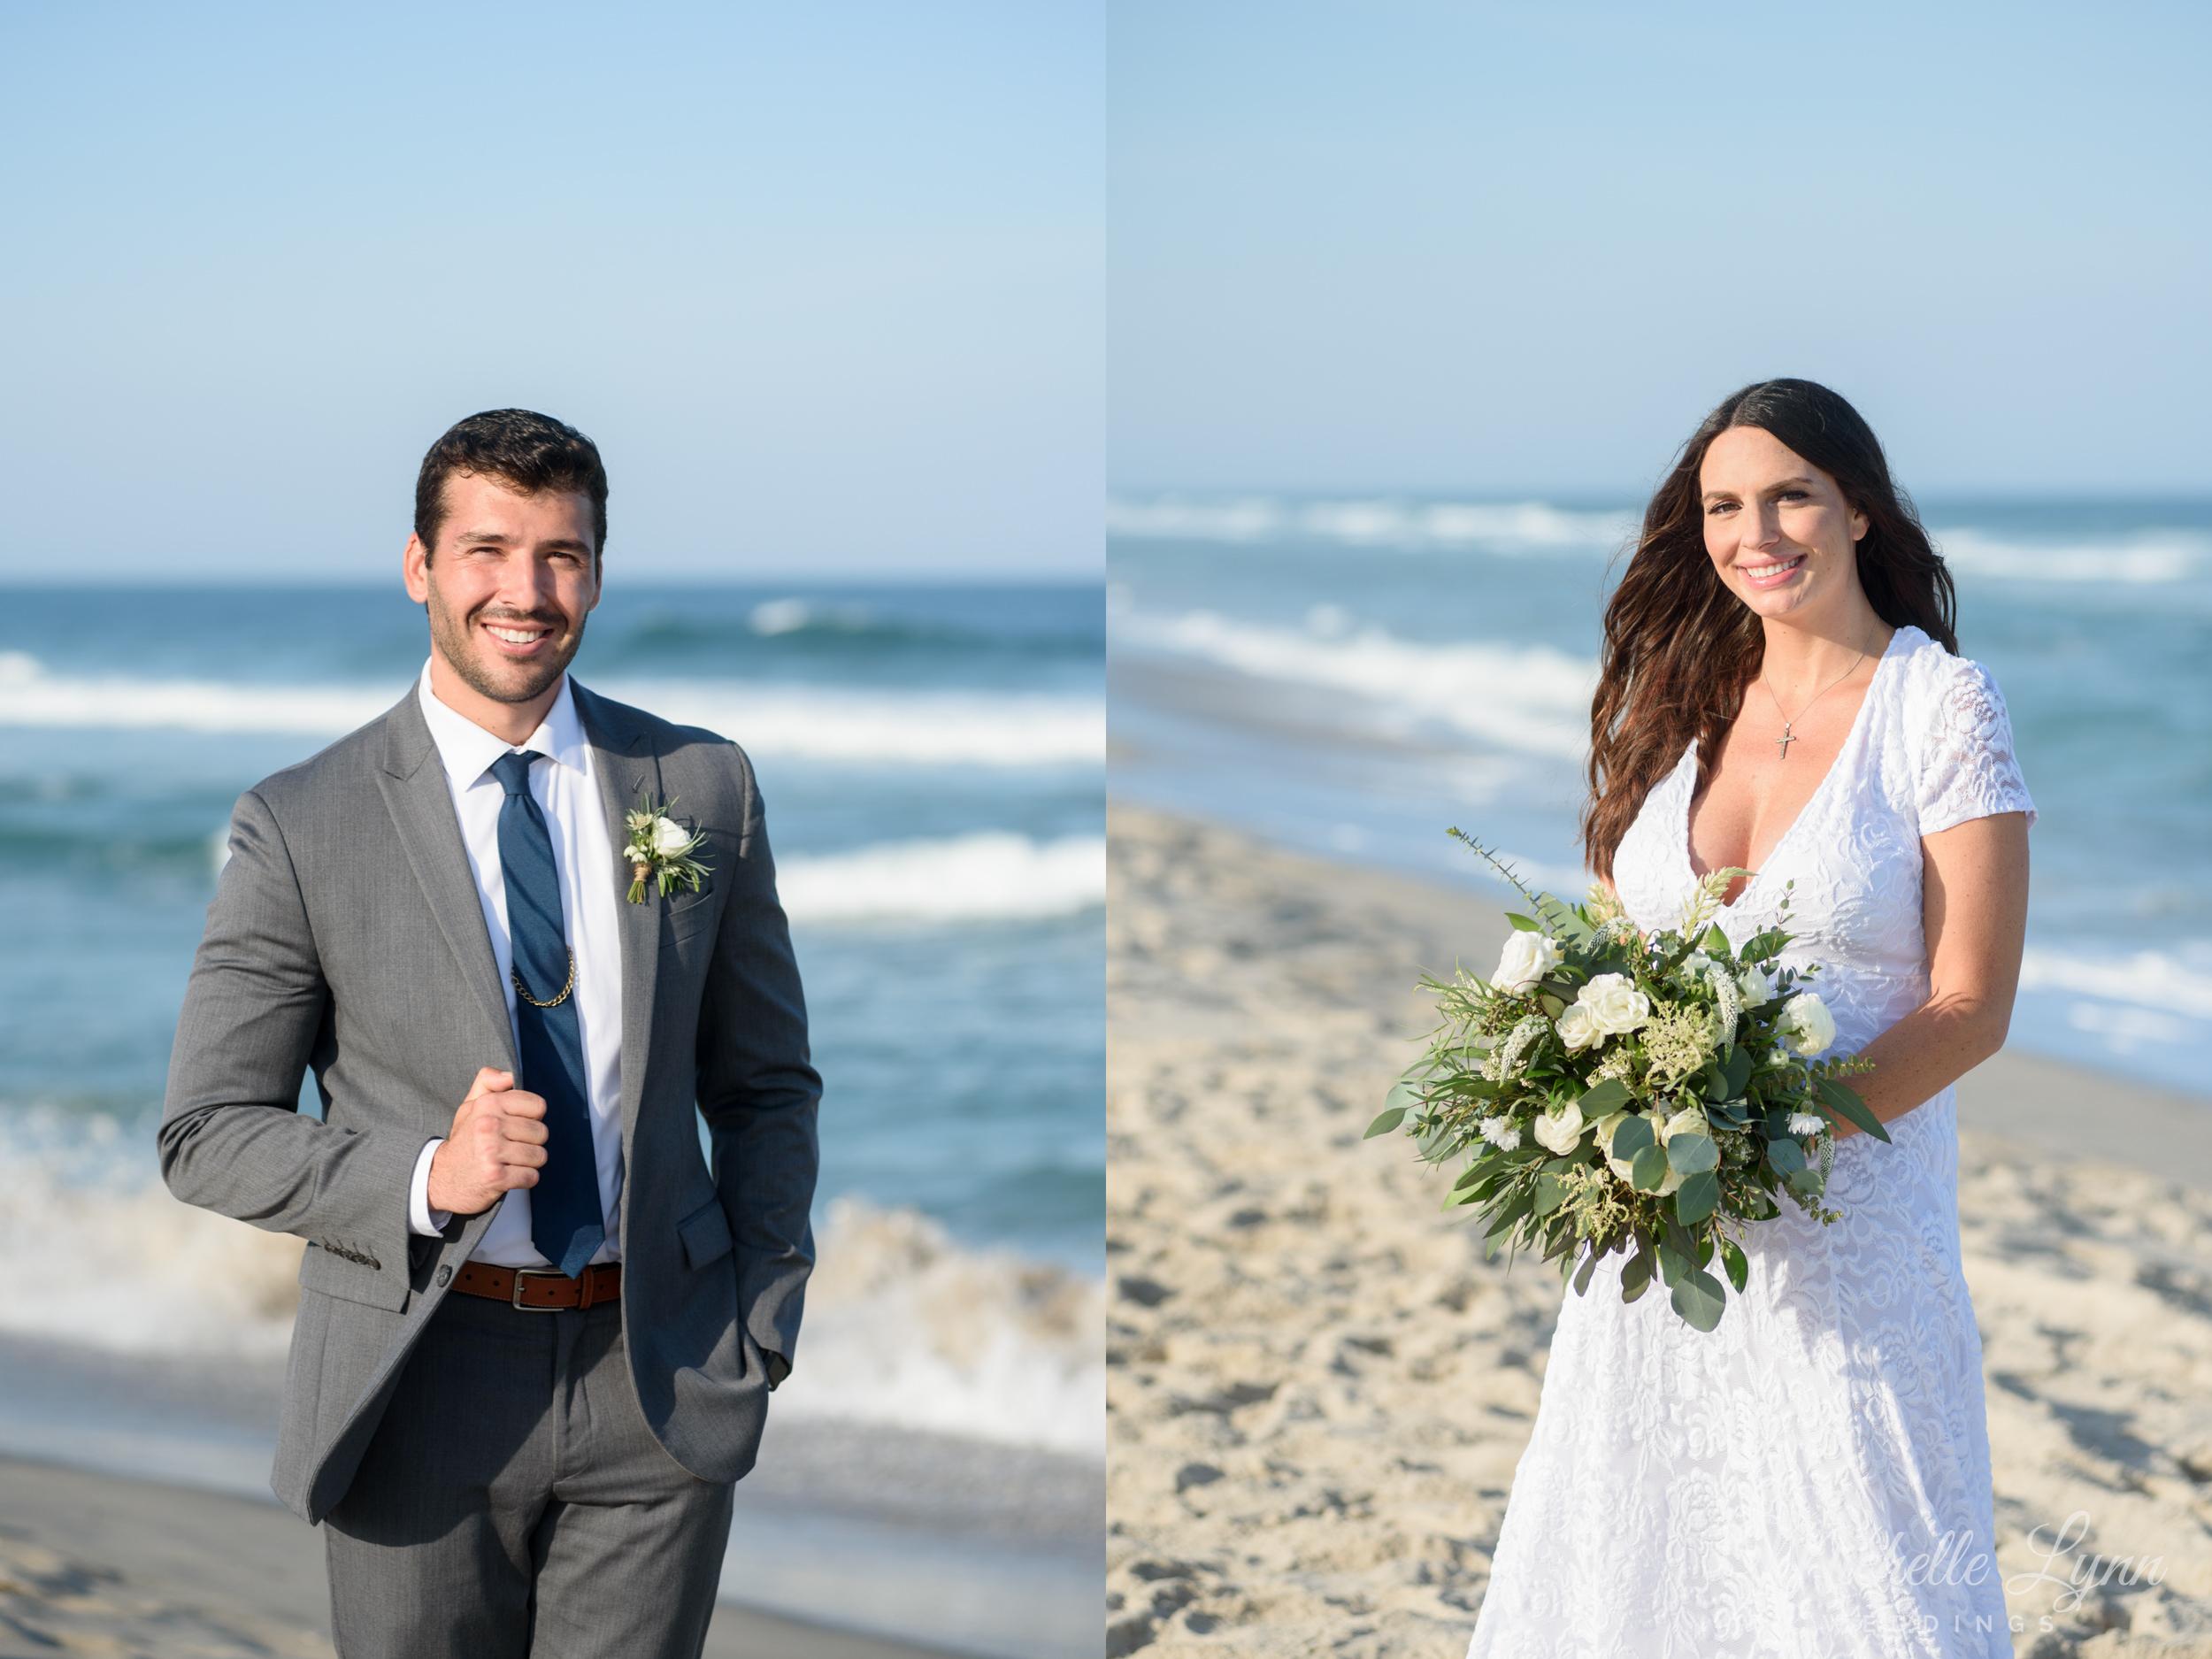 mlw-long-beach-island-new-jersey-wedding-photography-4.jpg